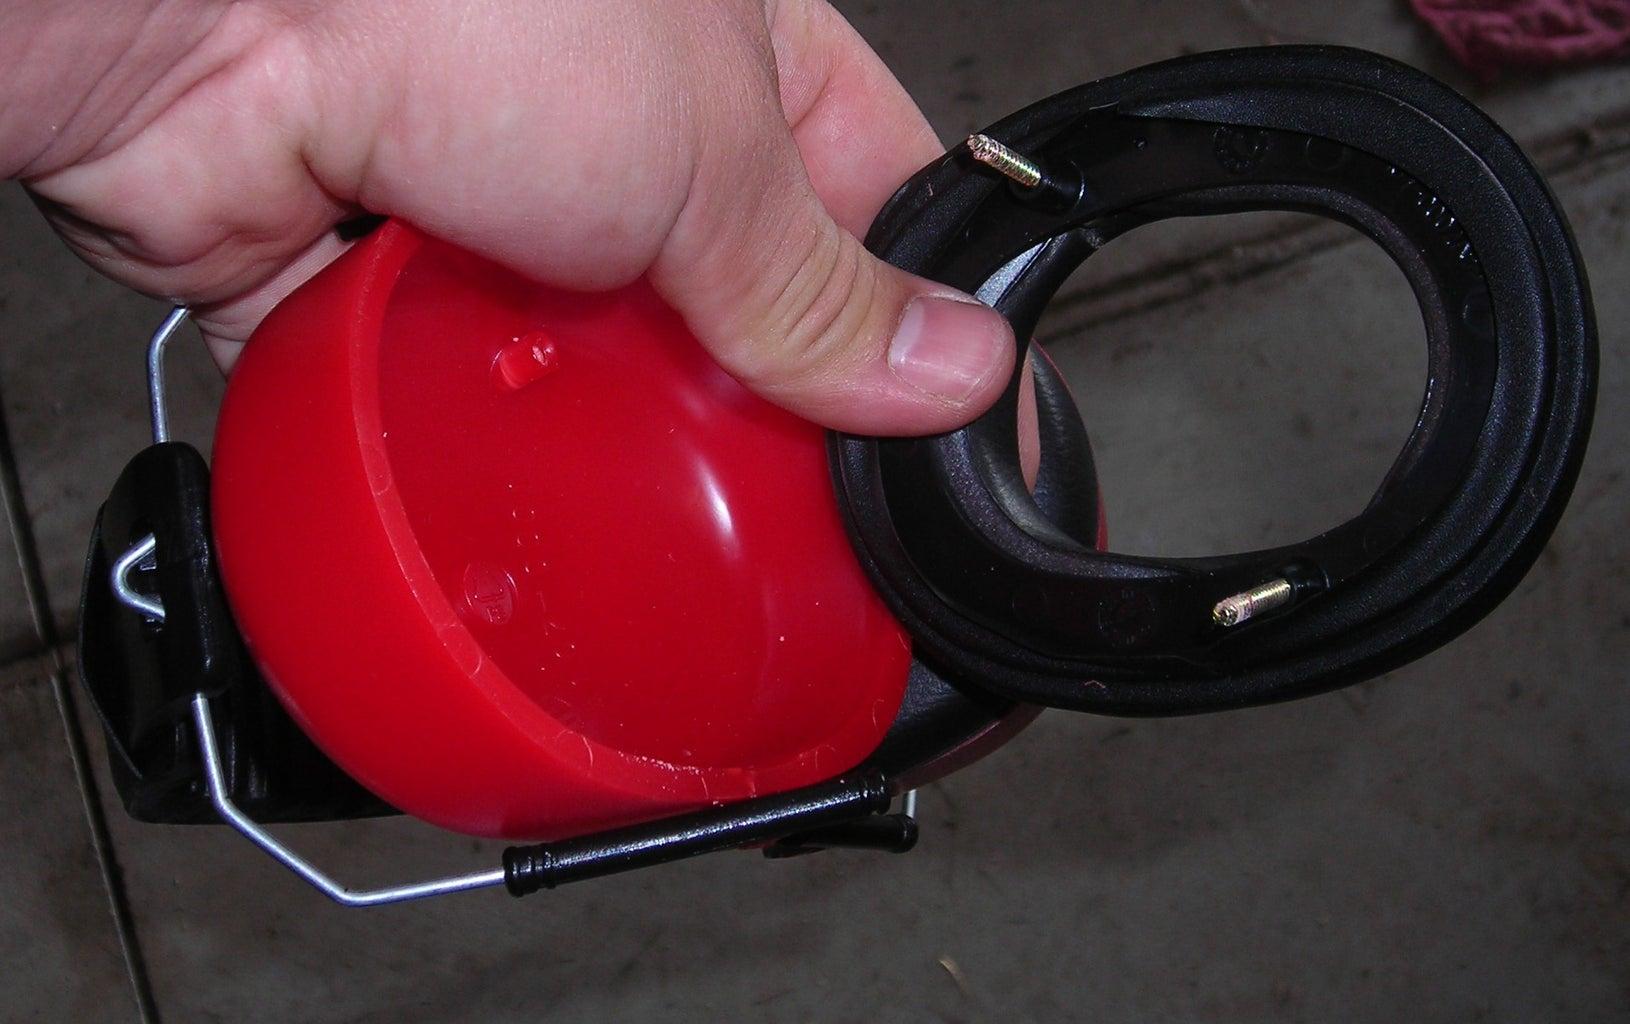 DIY Homemade Passive Noise Reducing Headphones